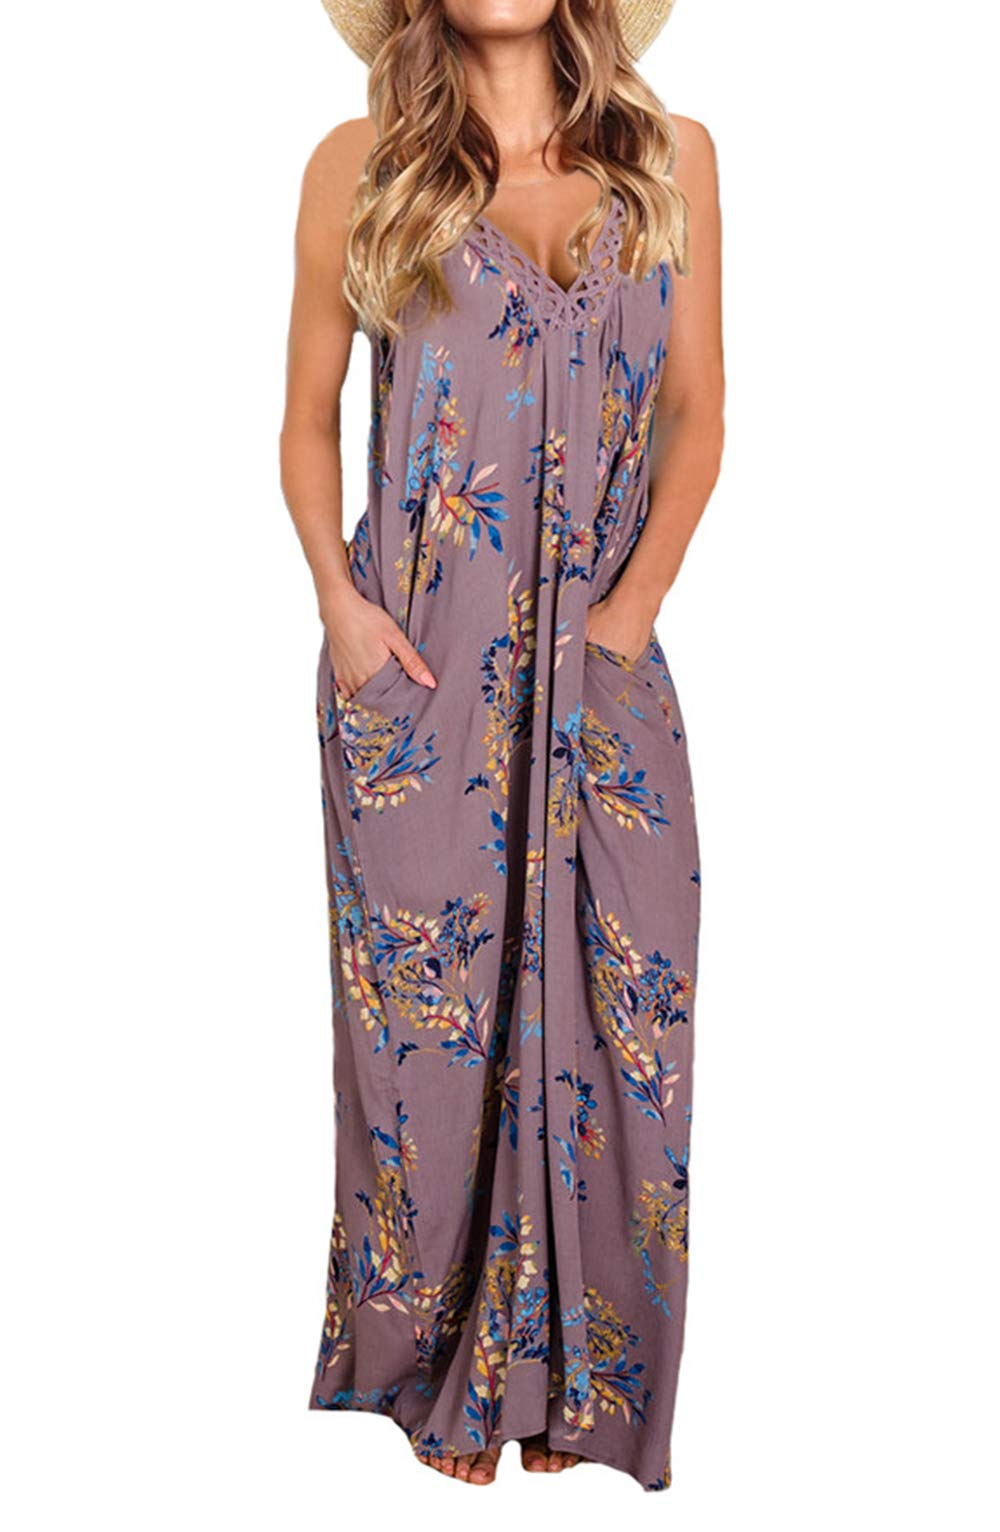 PRETTYGARDEN Women's Spaghetti Strap Floral Print Deep V Neck Boho Maxi Long Flowy Dress with Pocket (Purple, Medium)